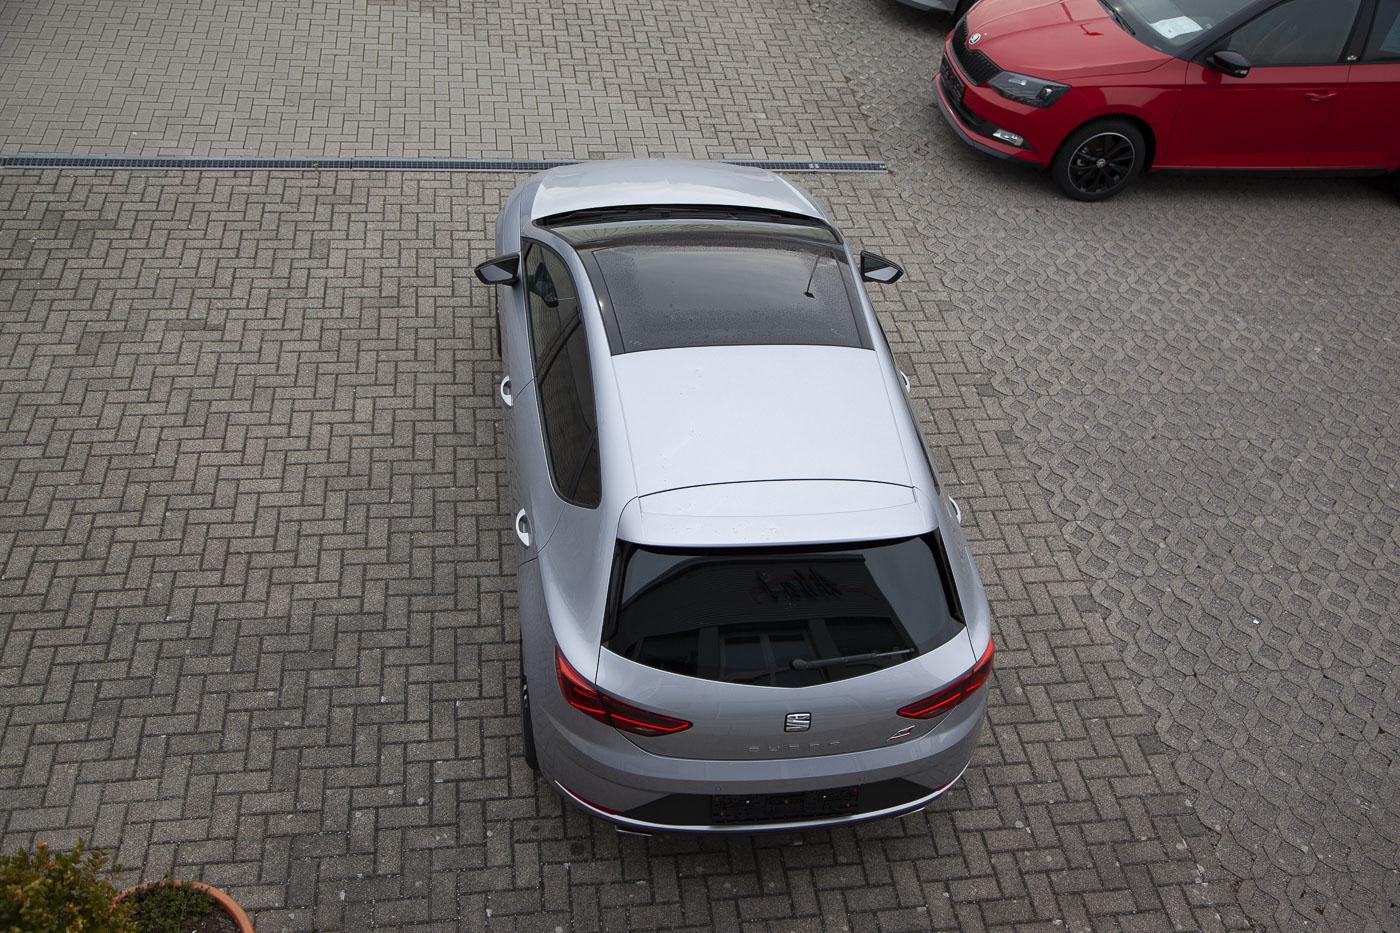 Seat Leon Cupra Limousine 2.0 TSI DSG / Deutsche Neufahrzeuge und EU-Neufahrzeuge – Aha! Fahrzeughandel GmbH in Althengstett